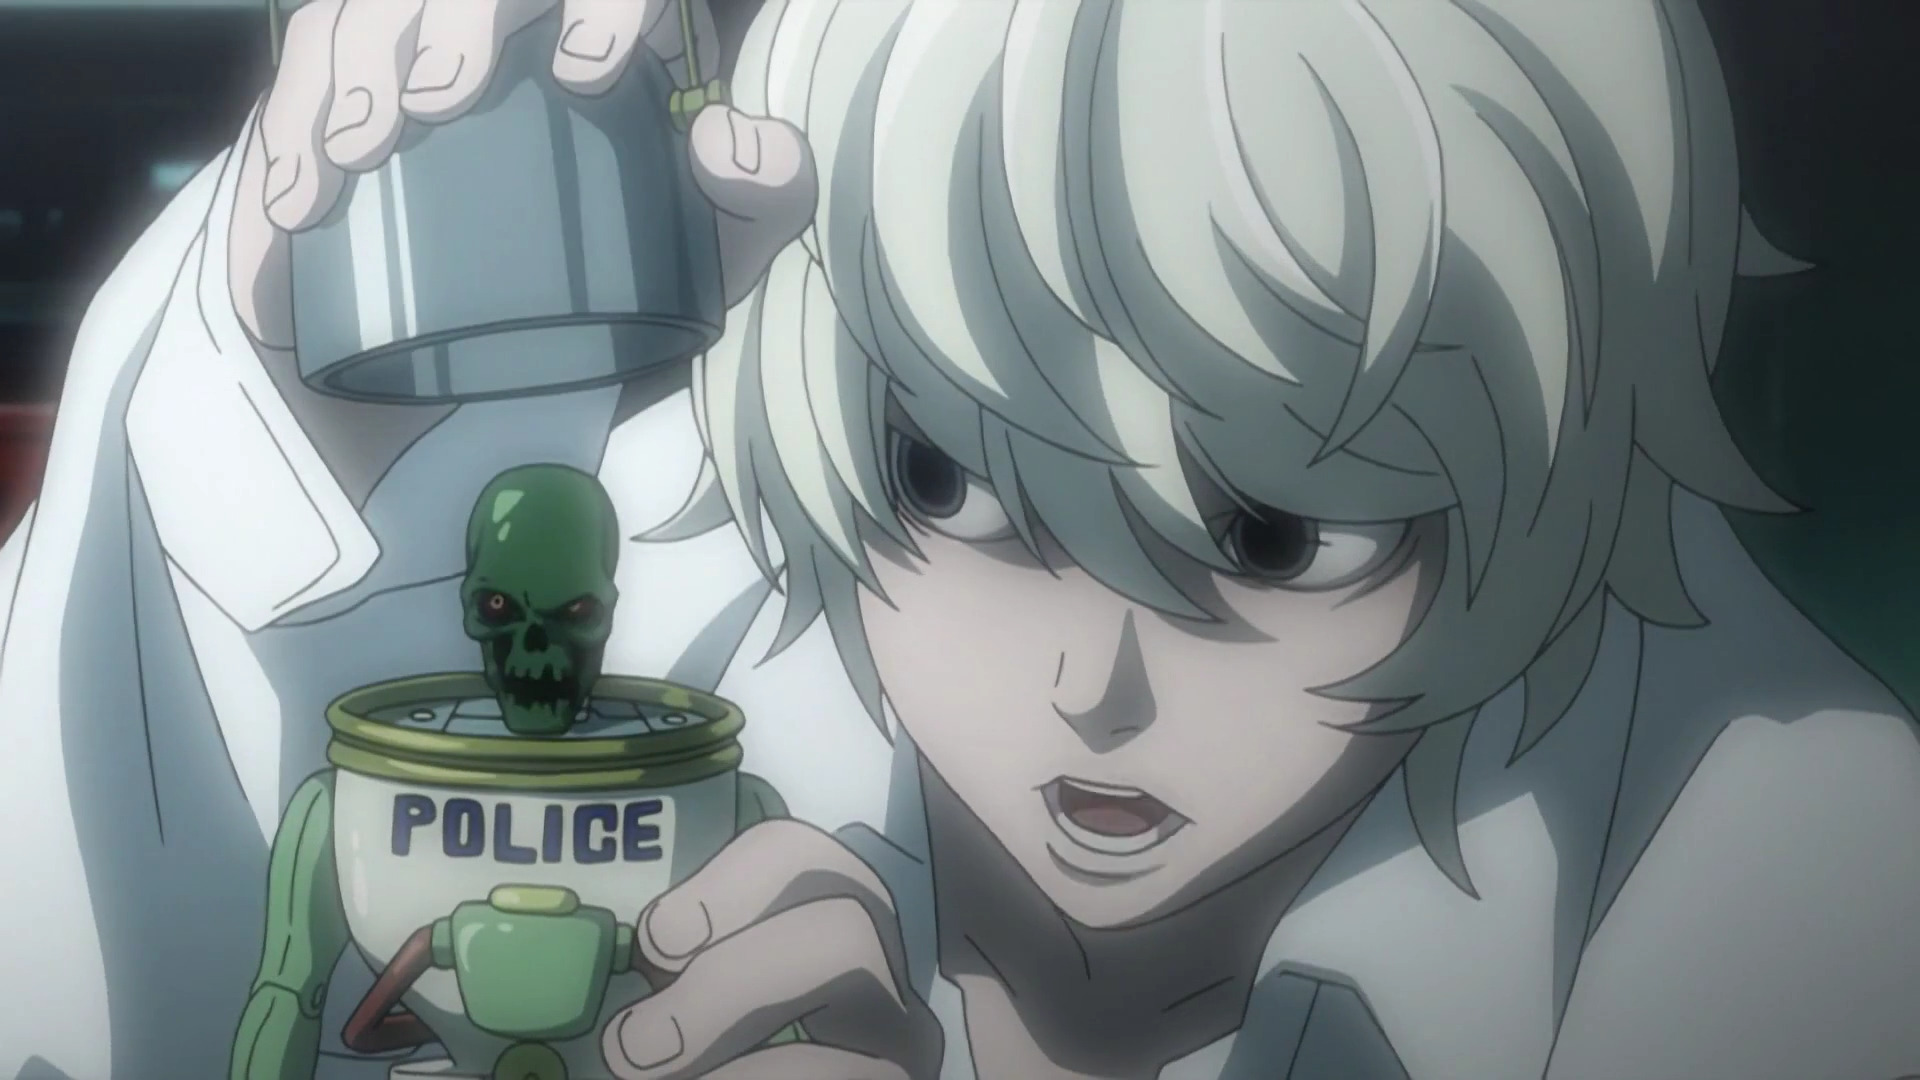 File:Near police toy.jpg